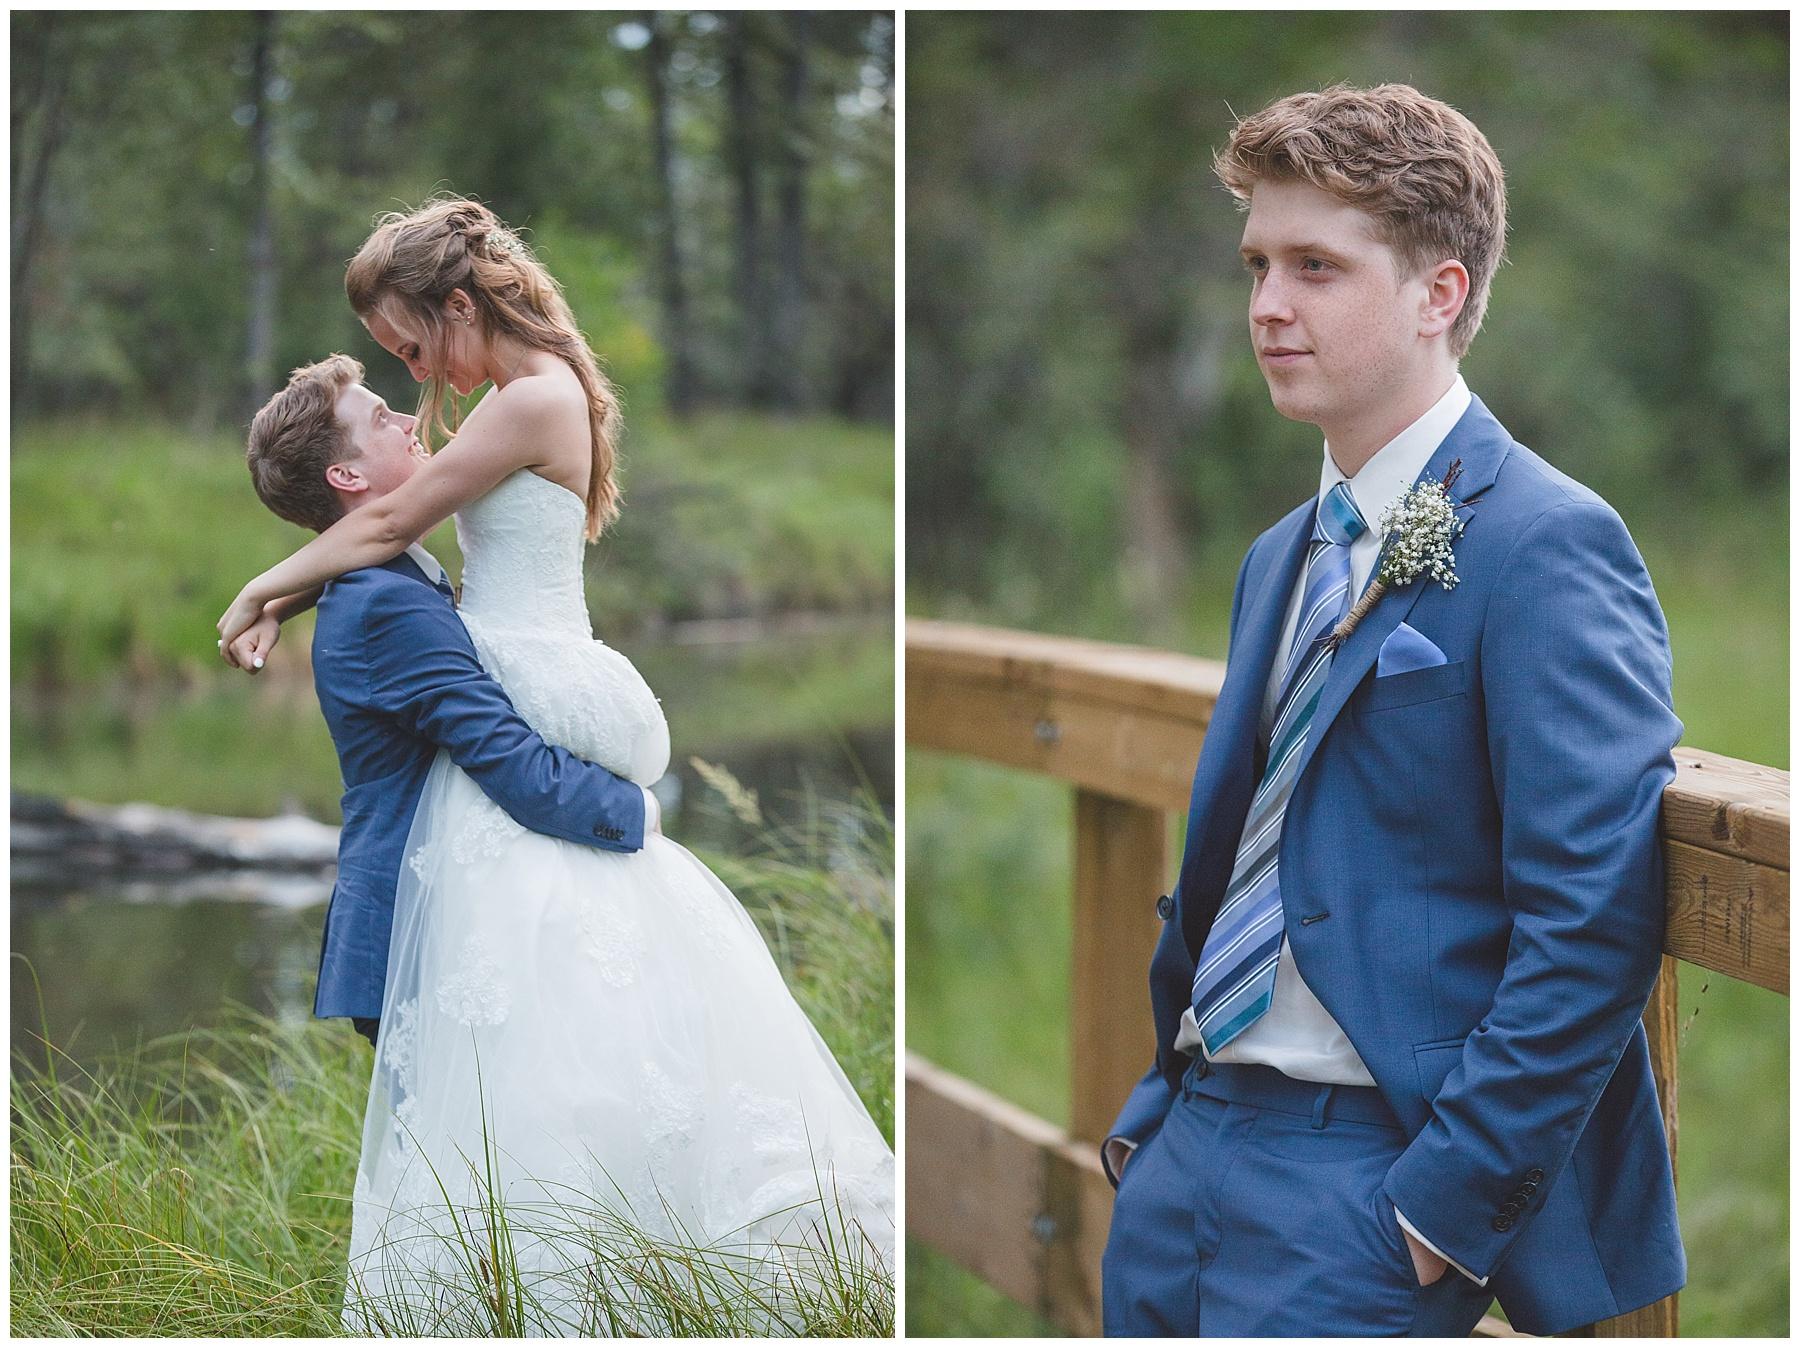 Evening wedding photograph in Calgary, Alberta